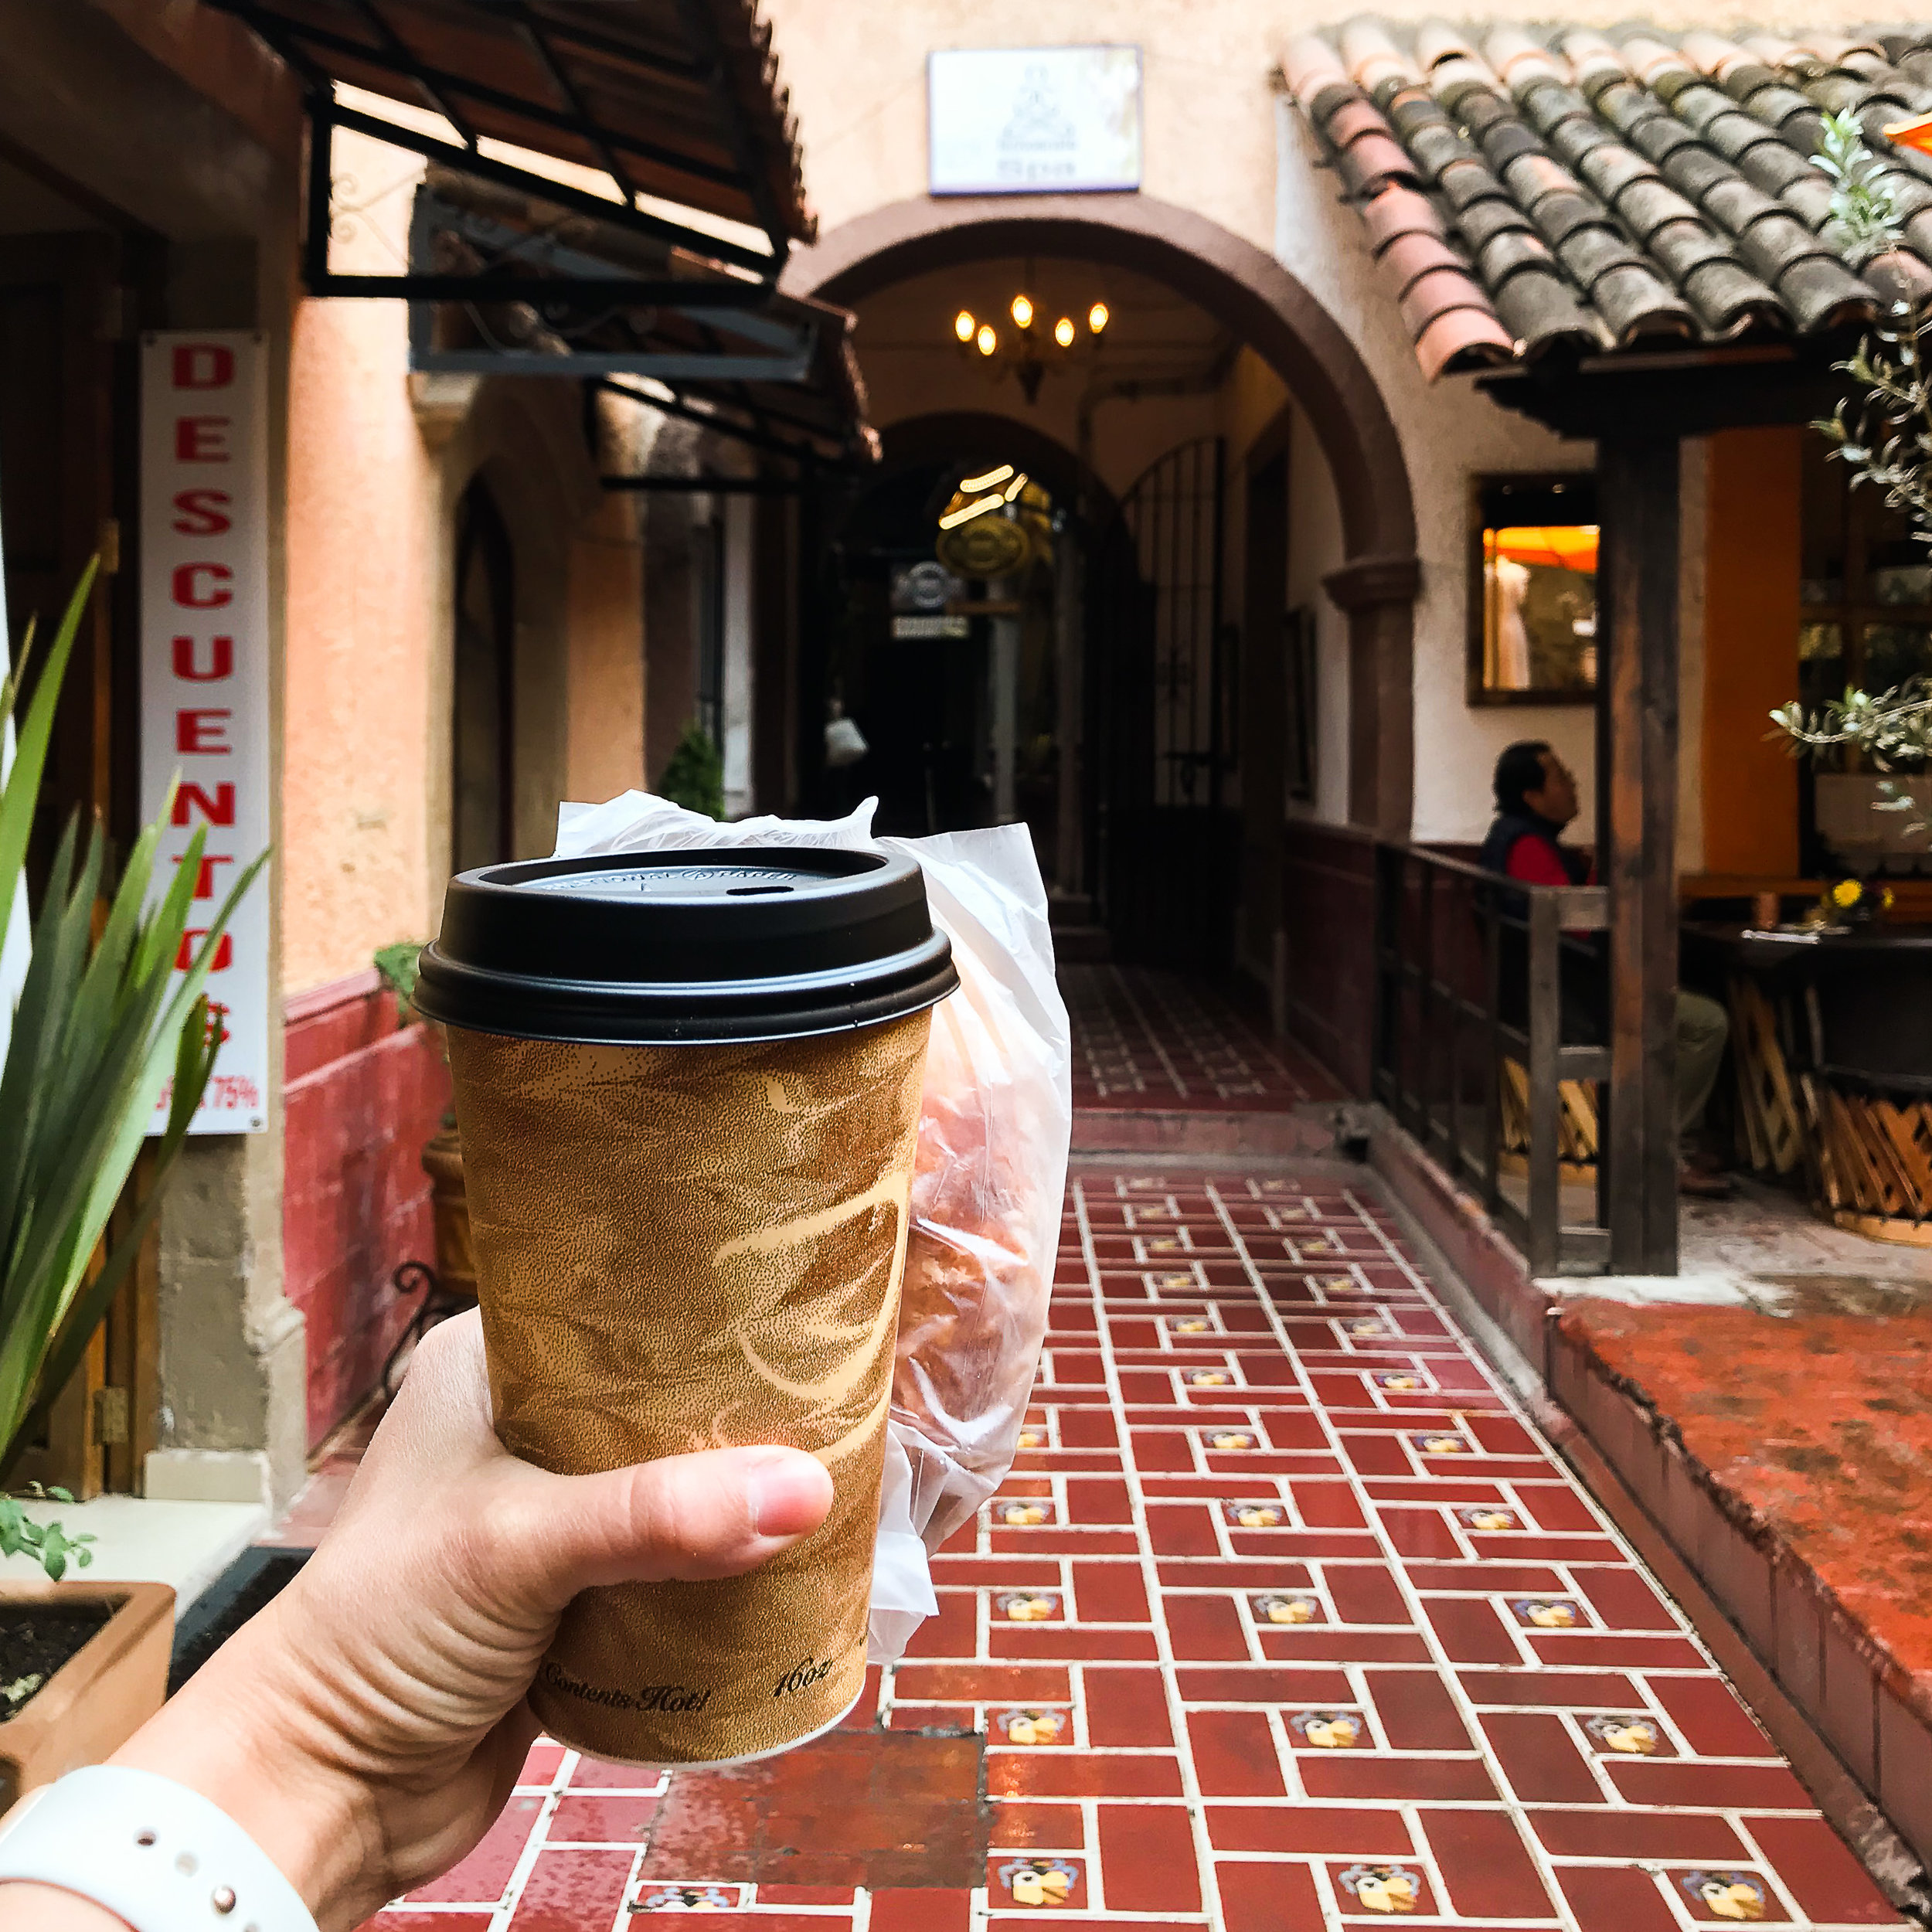 mexican-food-san-miguel-de-allende-restuarants-coffee-cafes-6.jpg